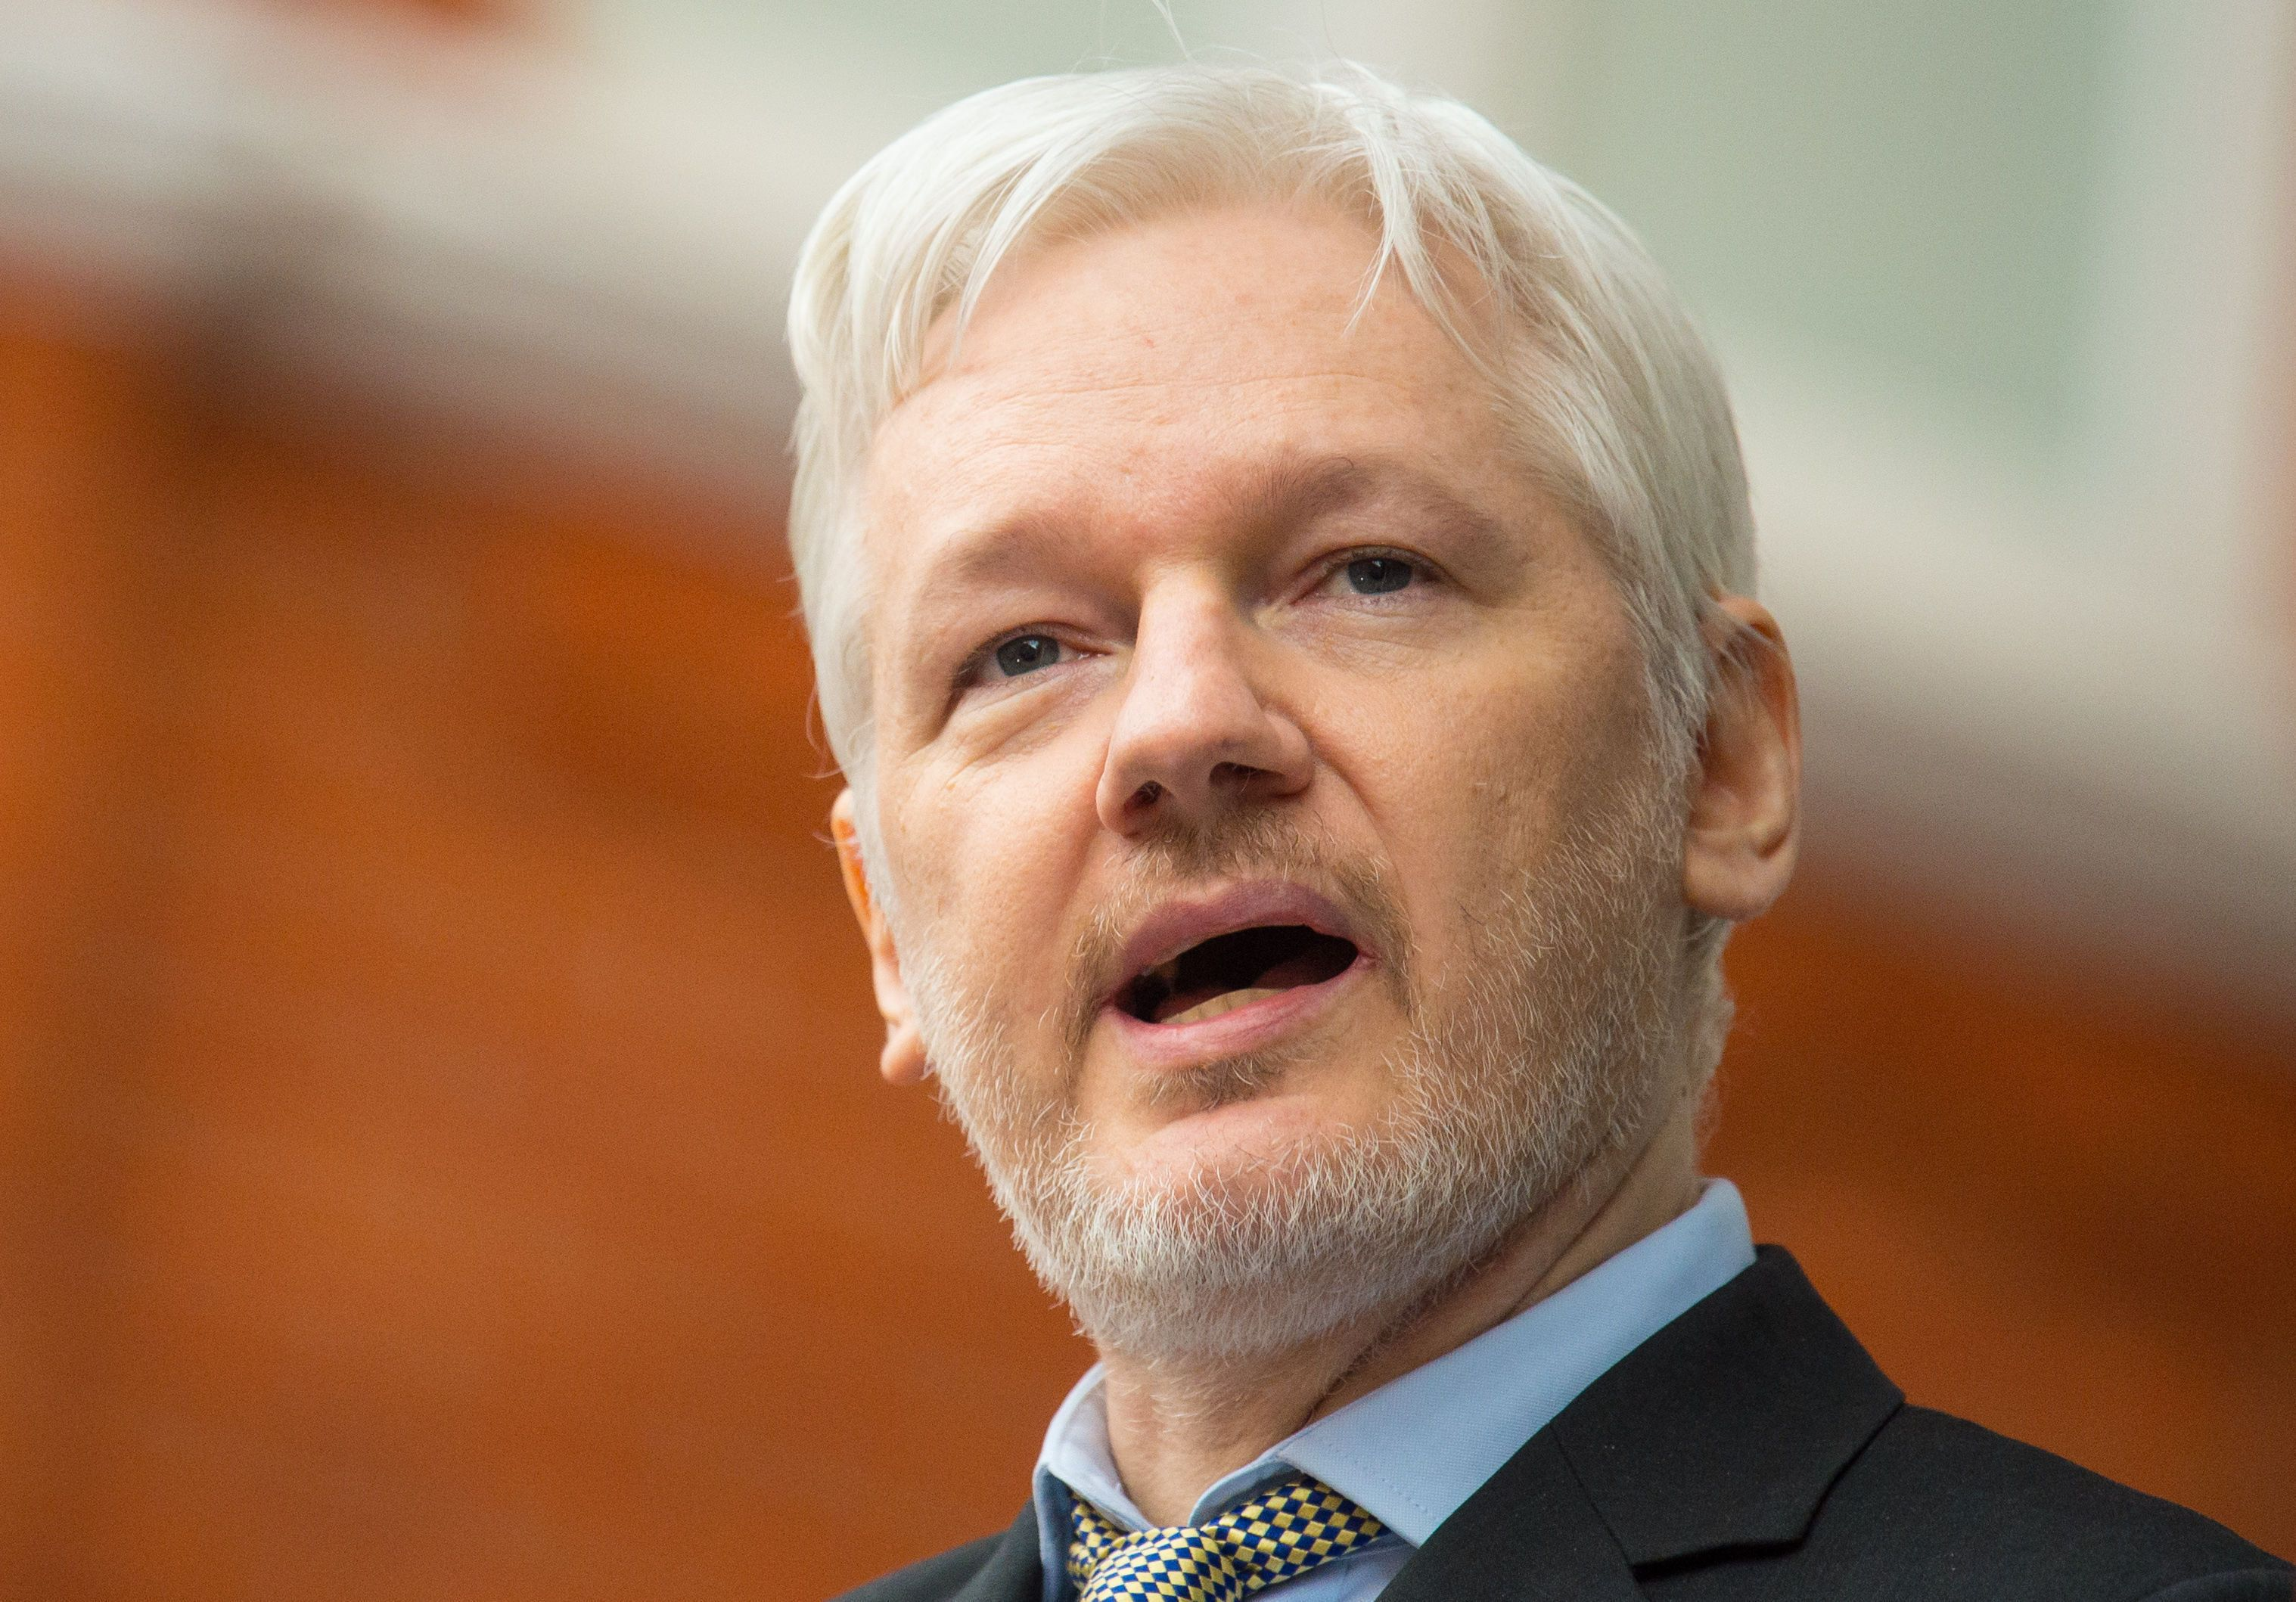 Julian Assange: Sweden Drops Investigation Against WikiLeaks Founder But He Still Faces Arrest By Met